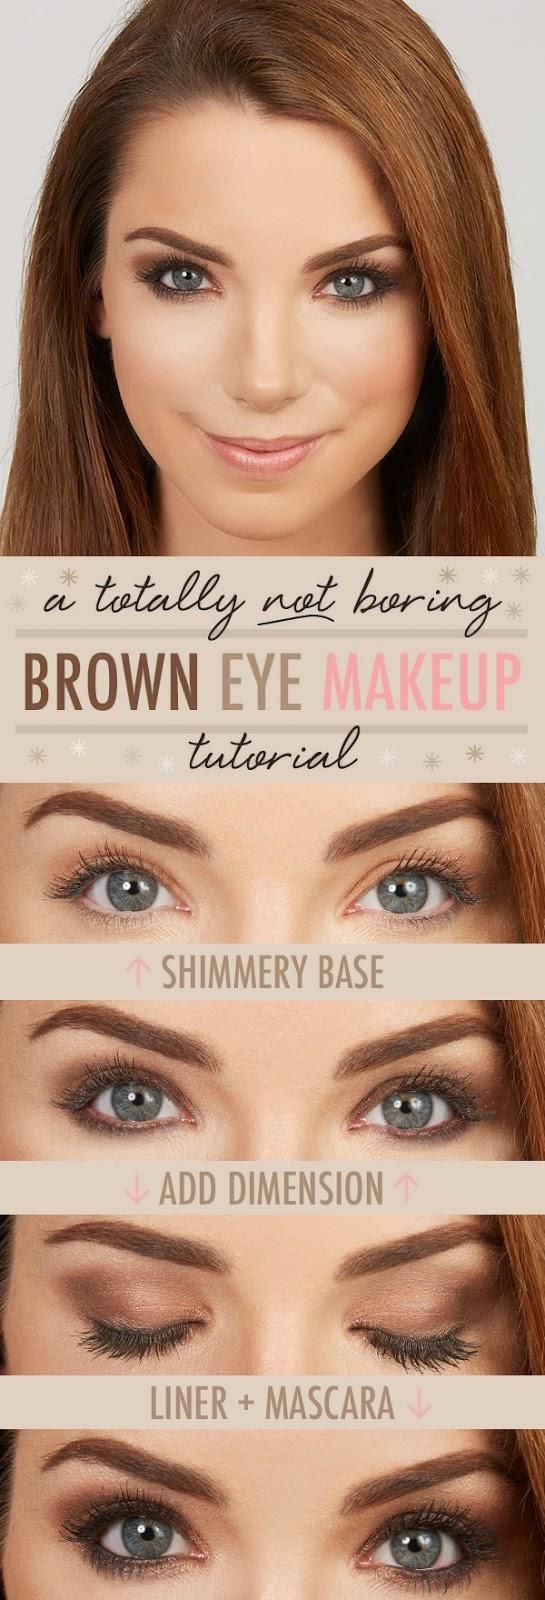 Younique By Kristen Morton Brown Eye Makeup Tutorial